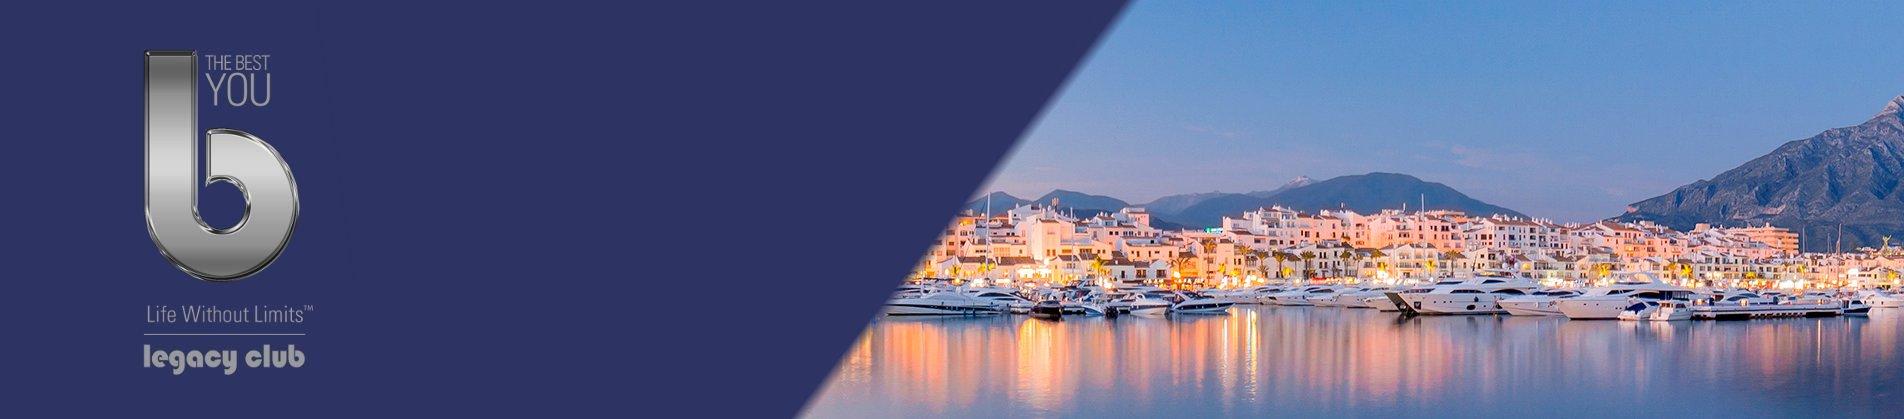 The Best You Legacy Club - Marbella